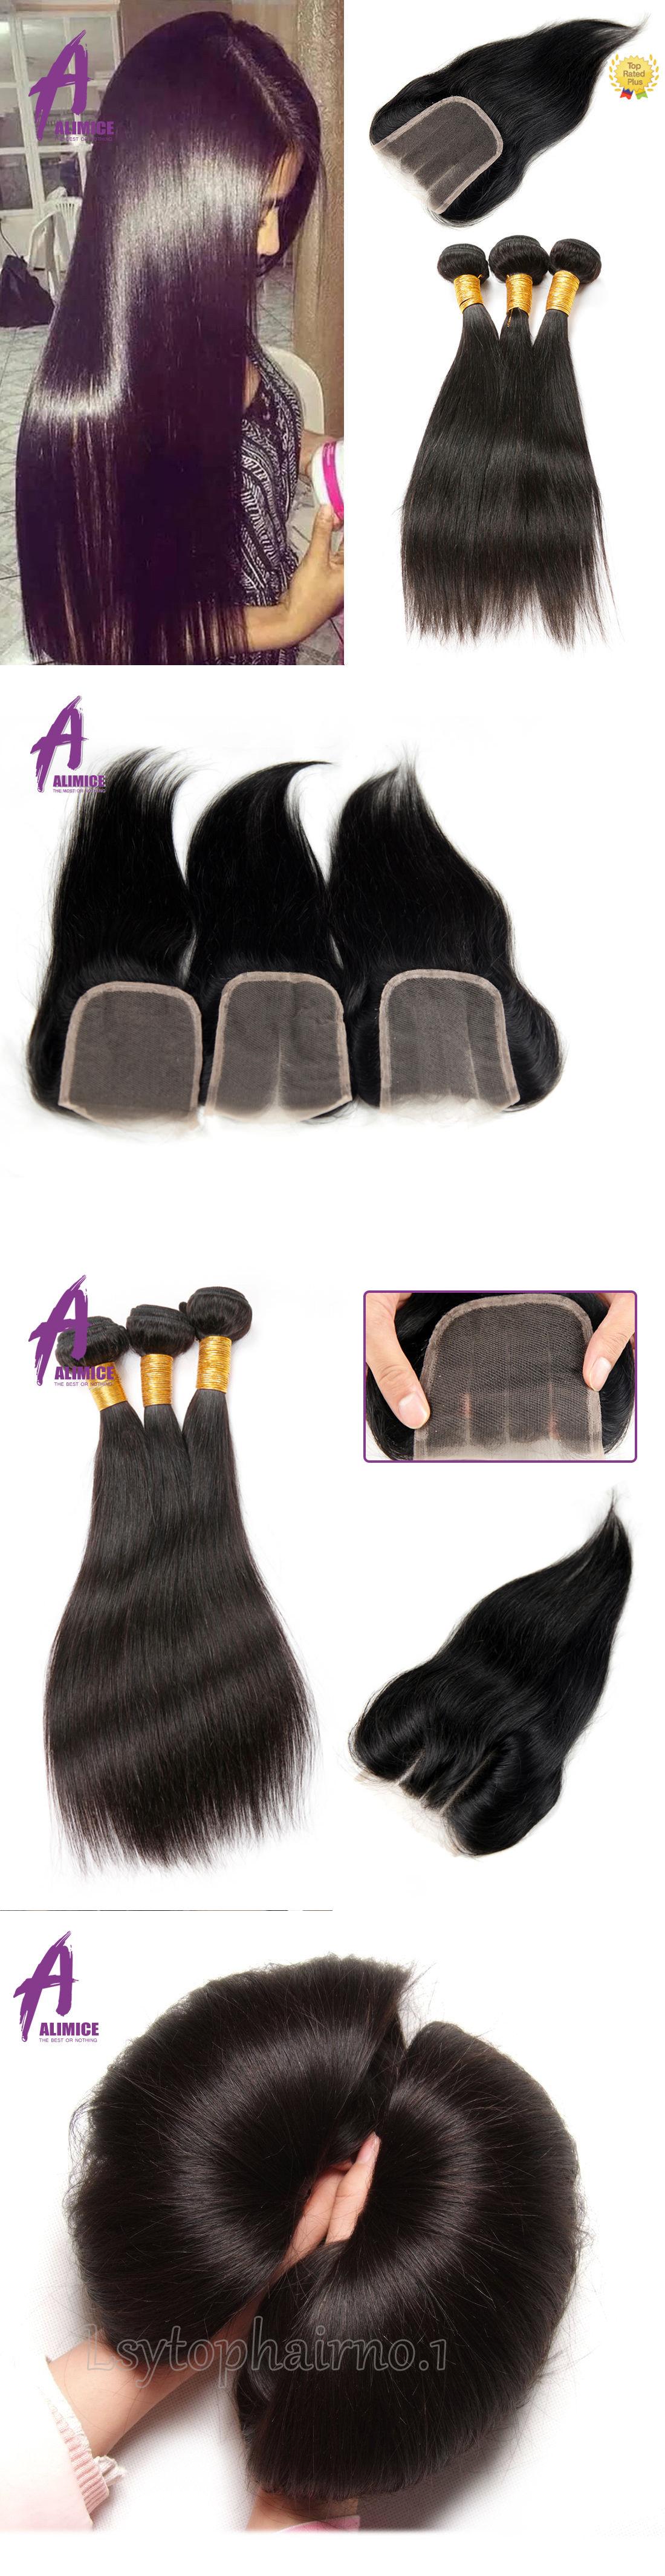 Hair Extensions Peruvian Hair With Lace Closure Human Hair